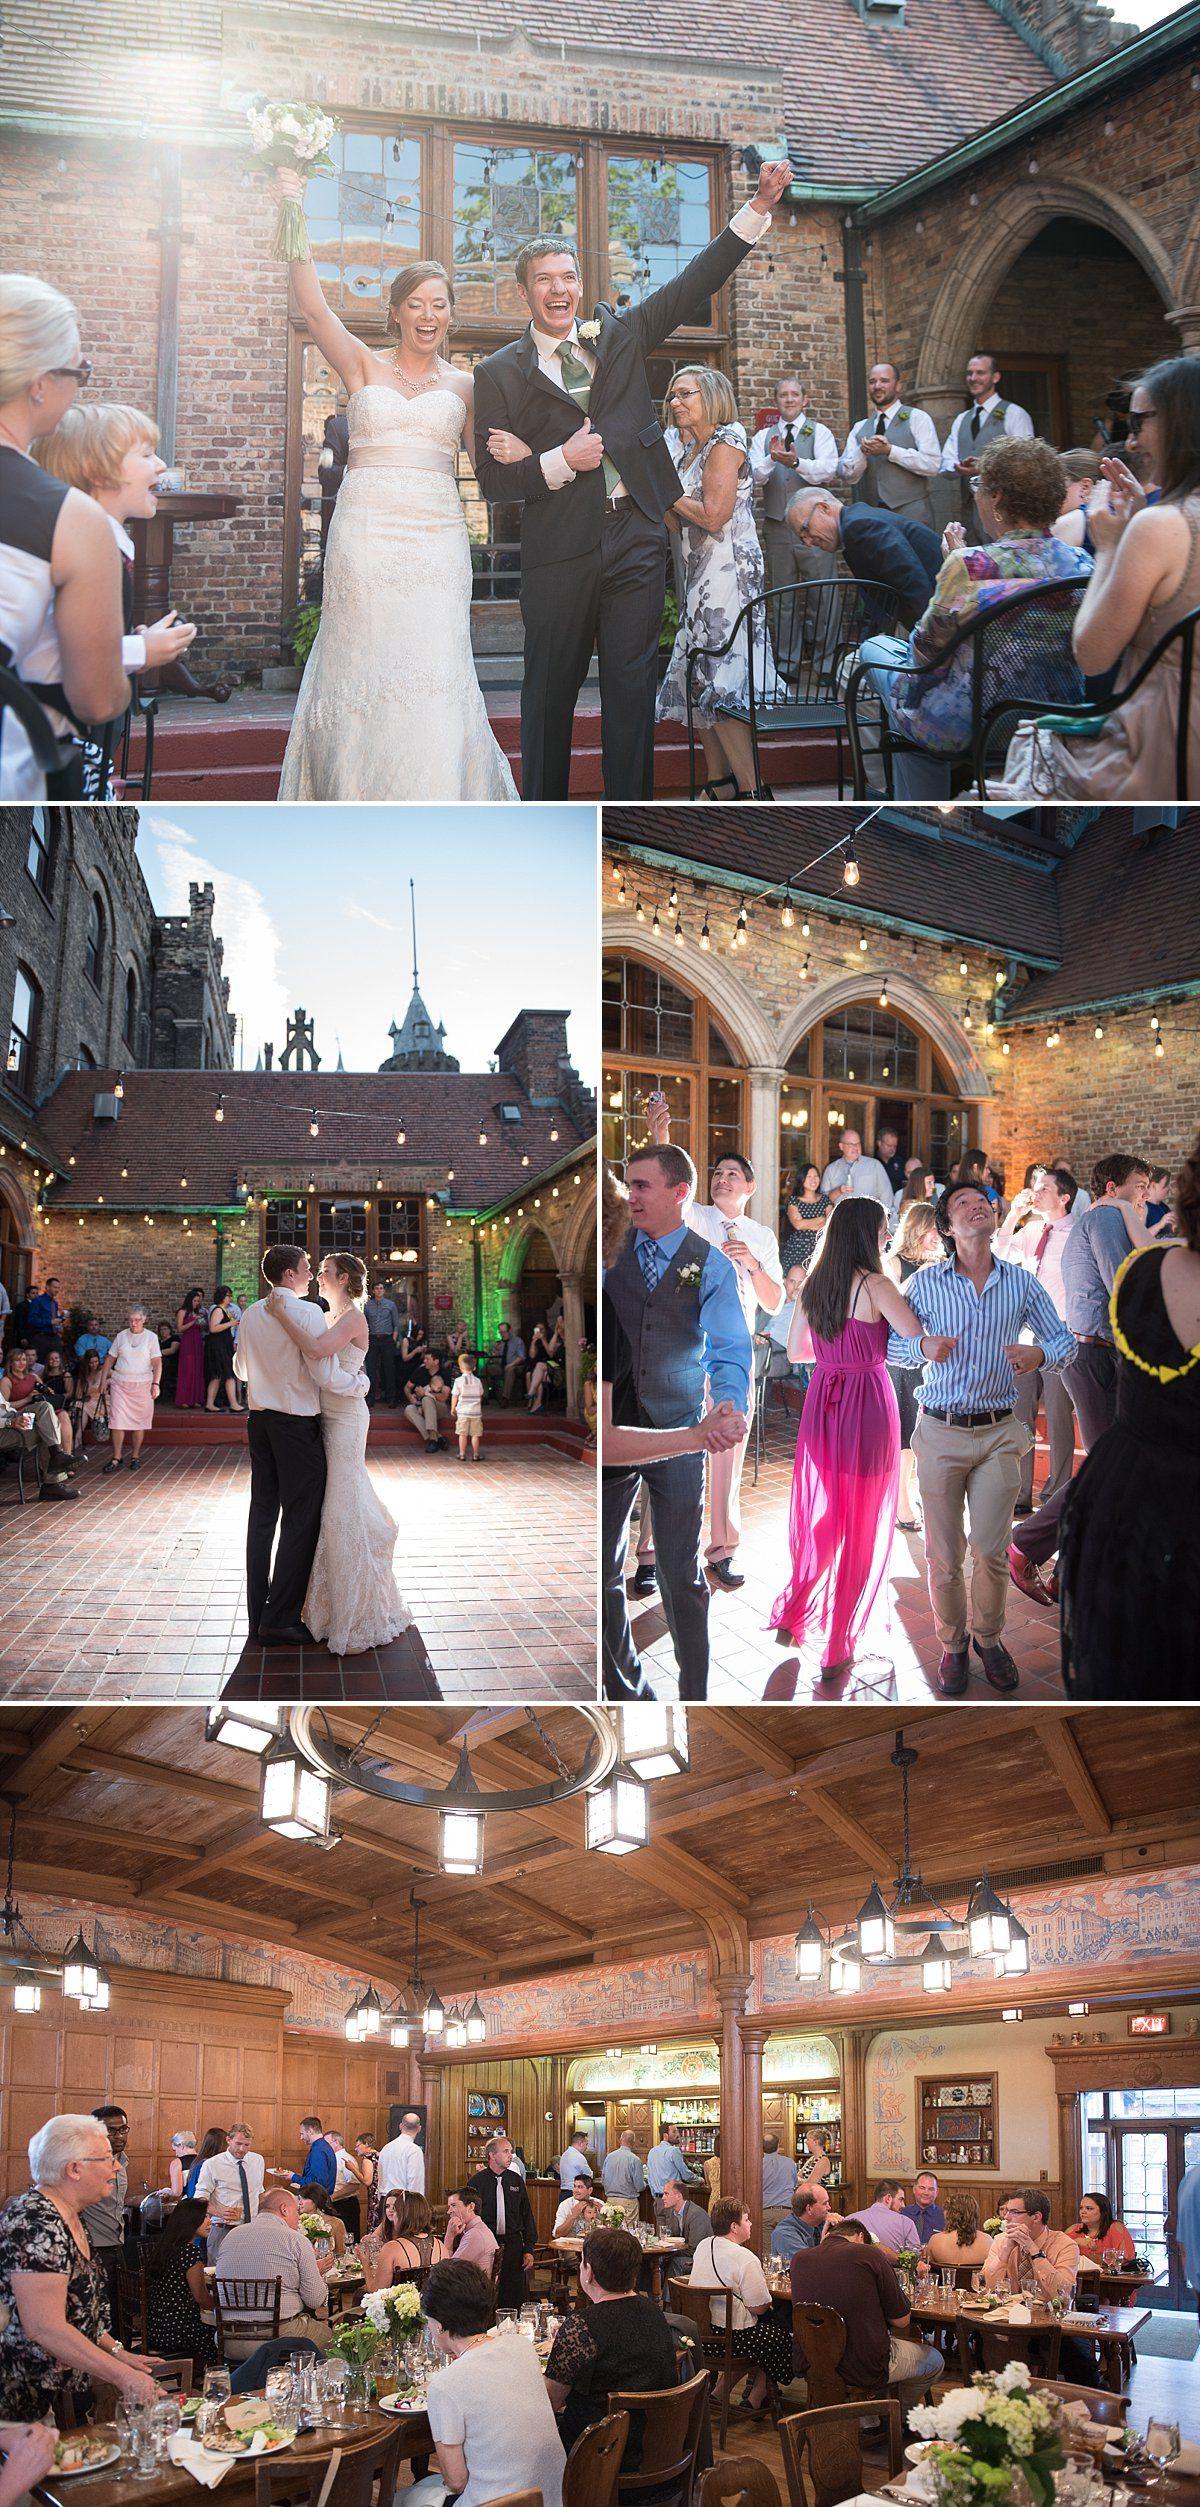 Pabst Brewery Wedding Wedding venues wisconsin, Wedding